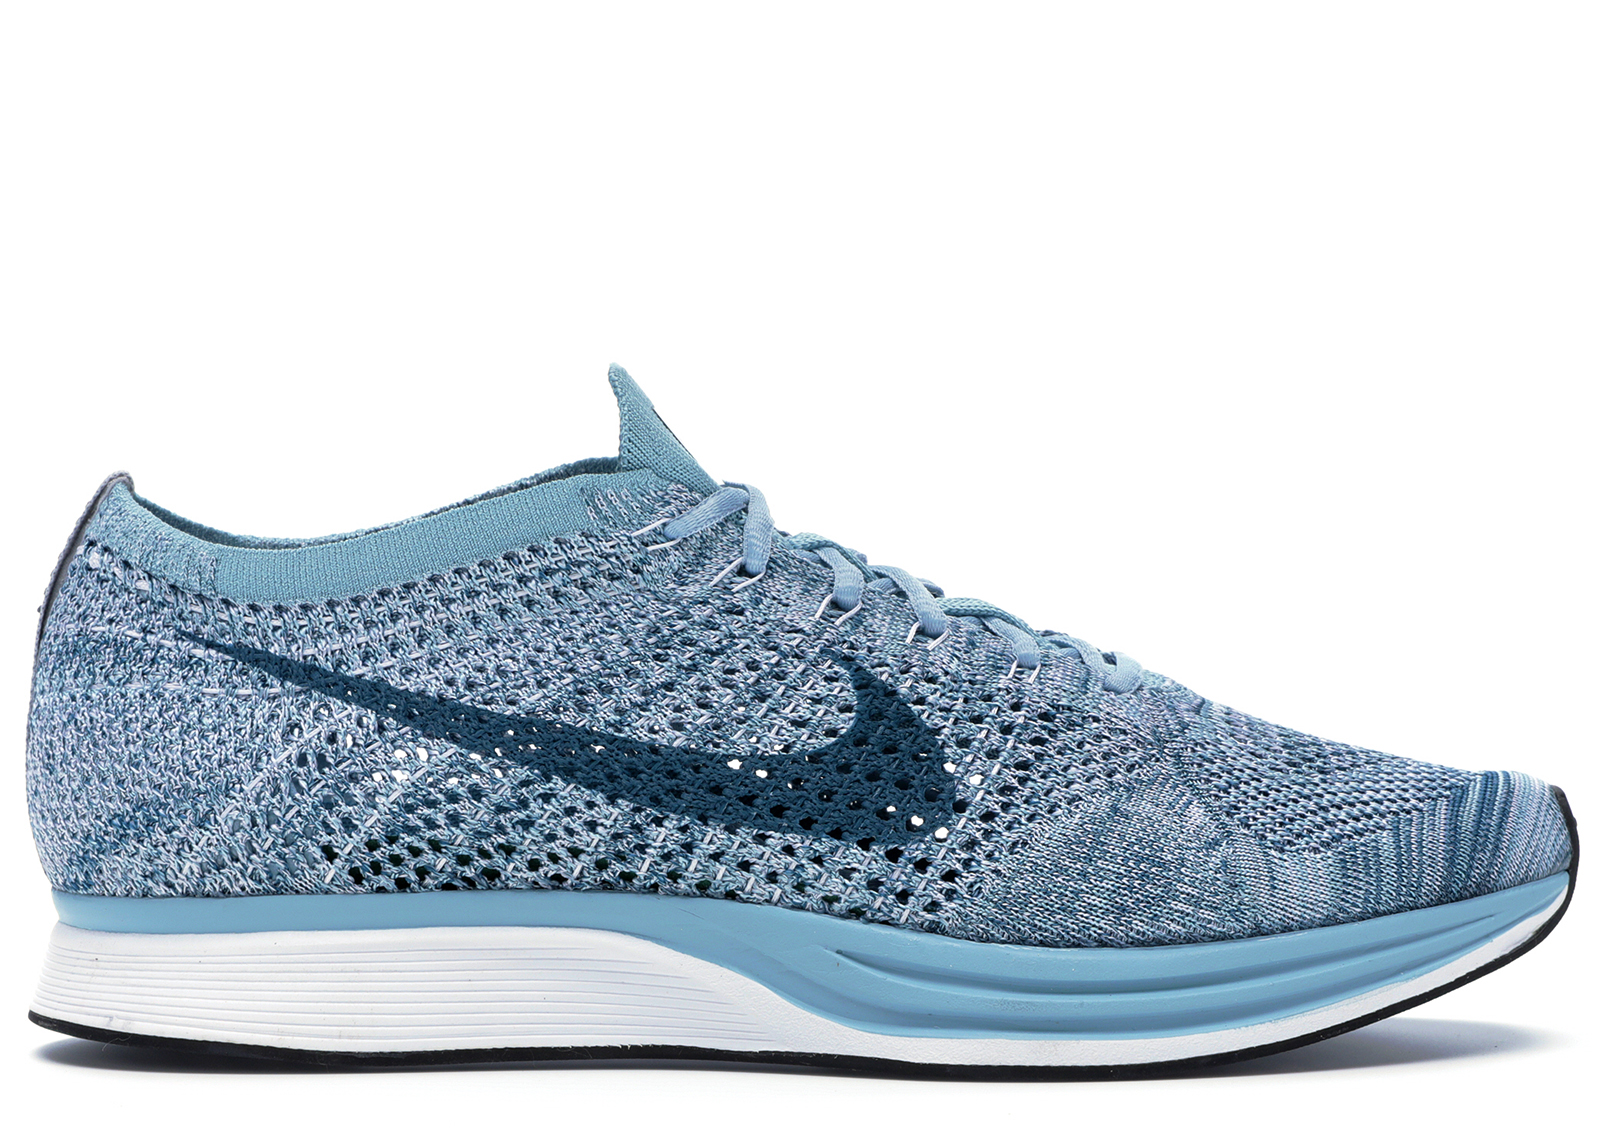 Nike Flyknit Racer Blueberry - 526628-102